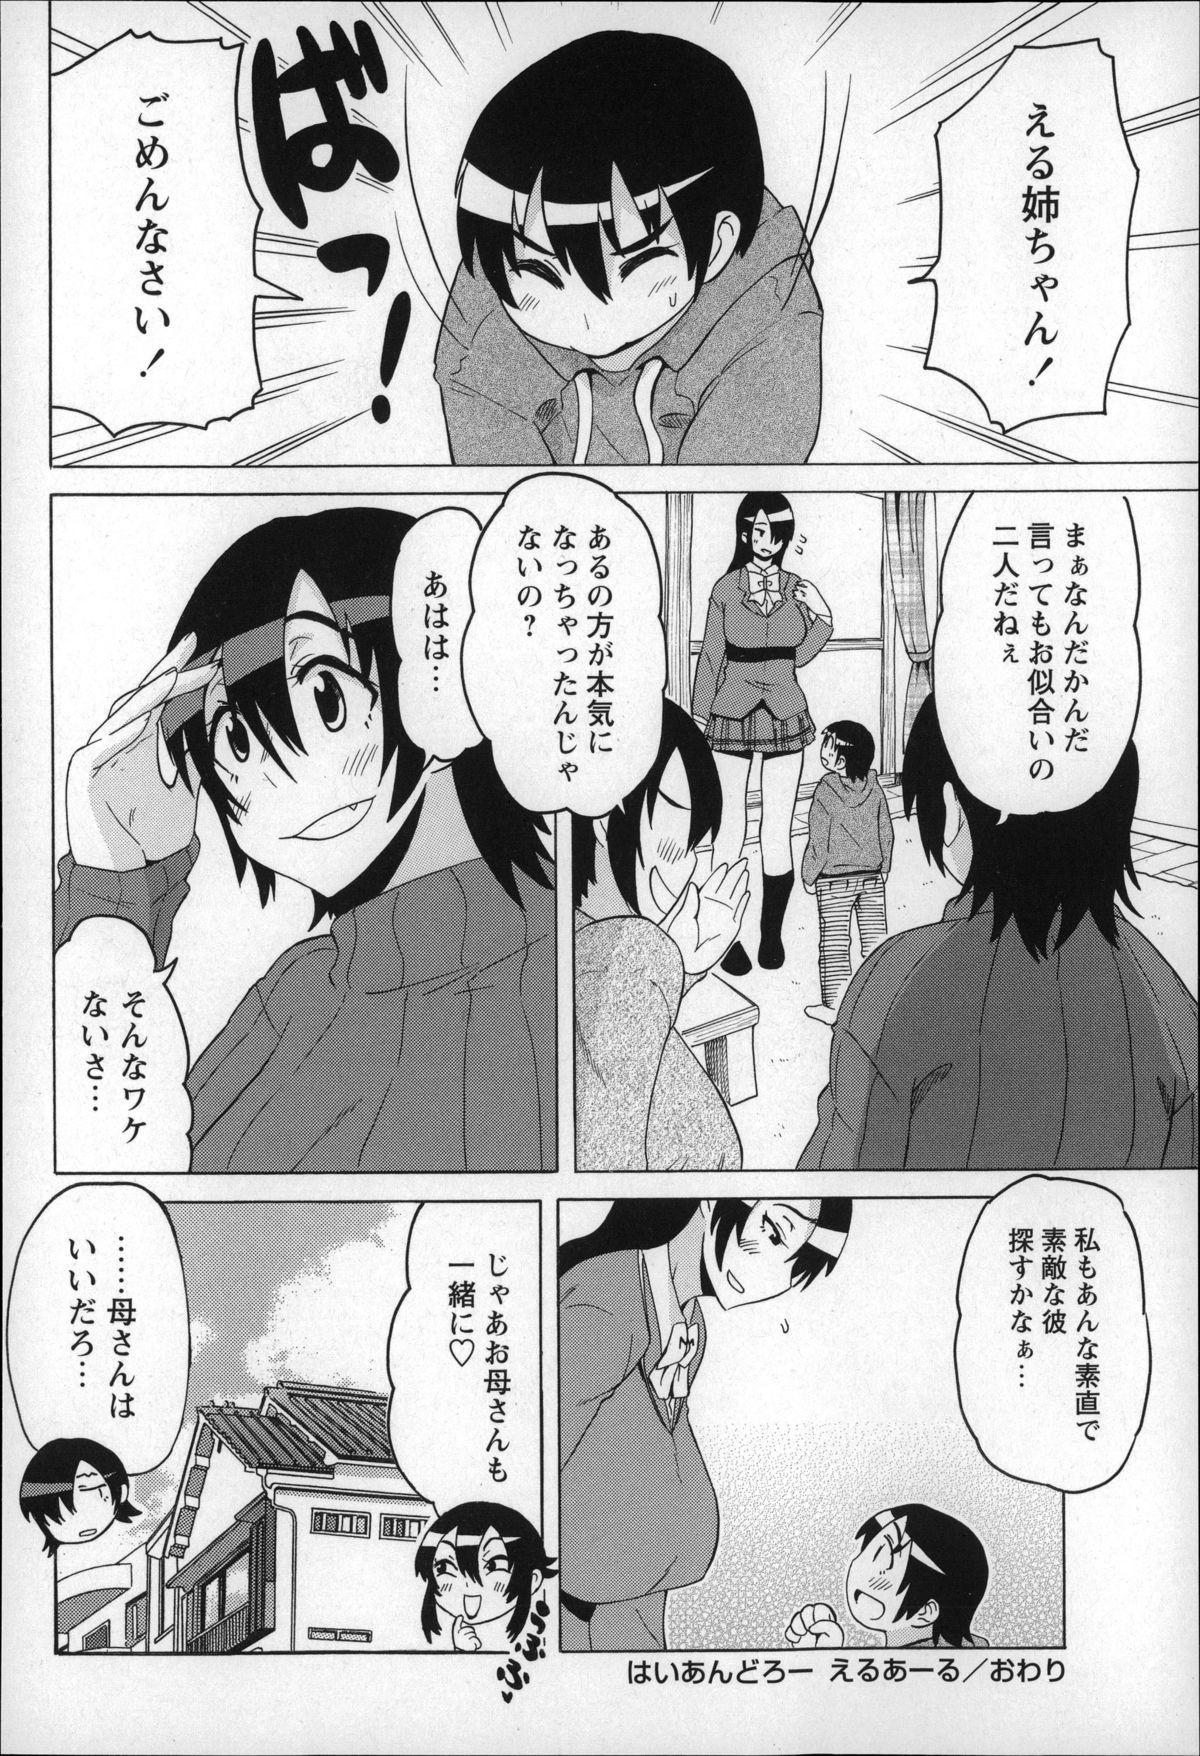 Shota Hunting 75